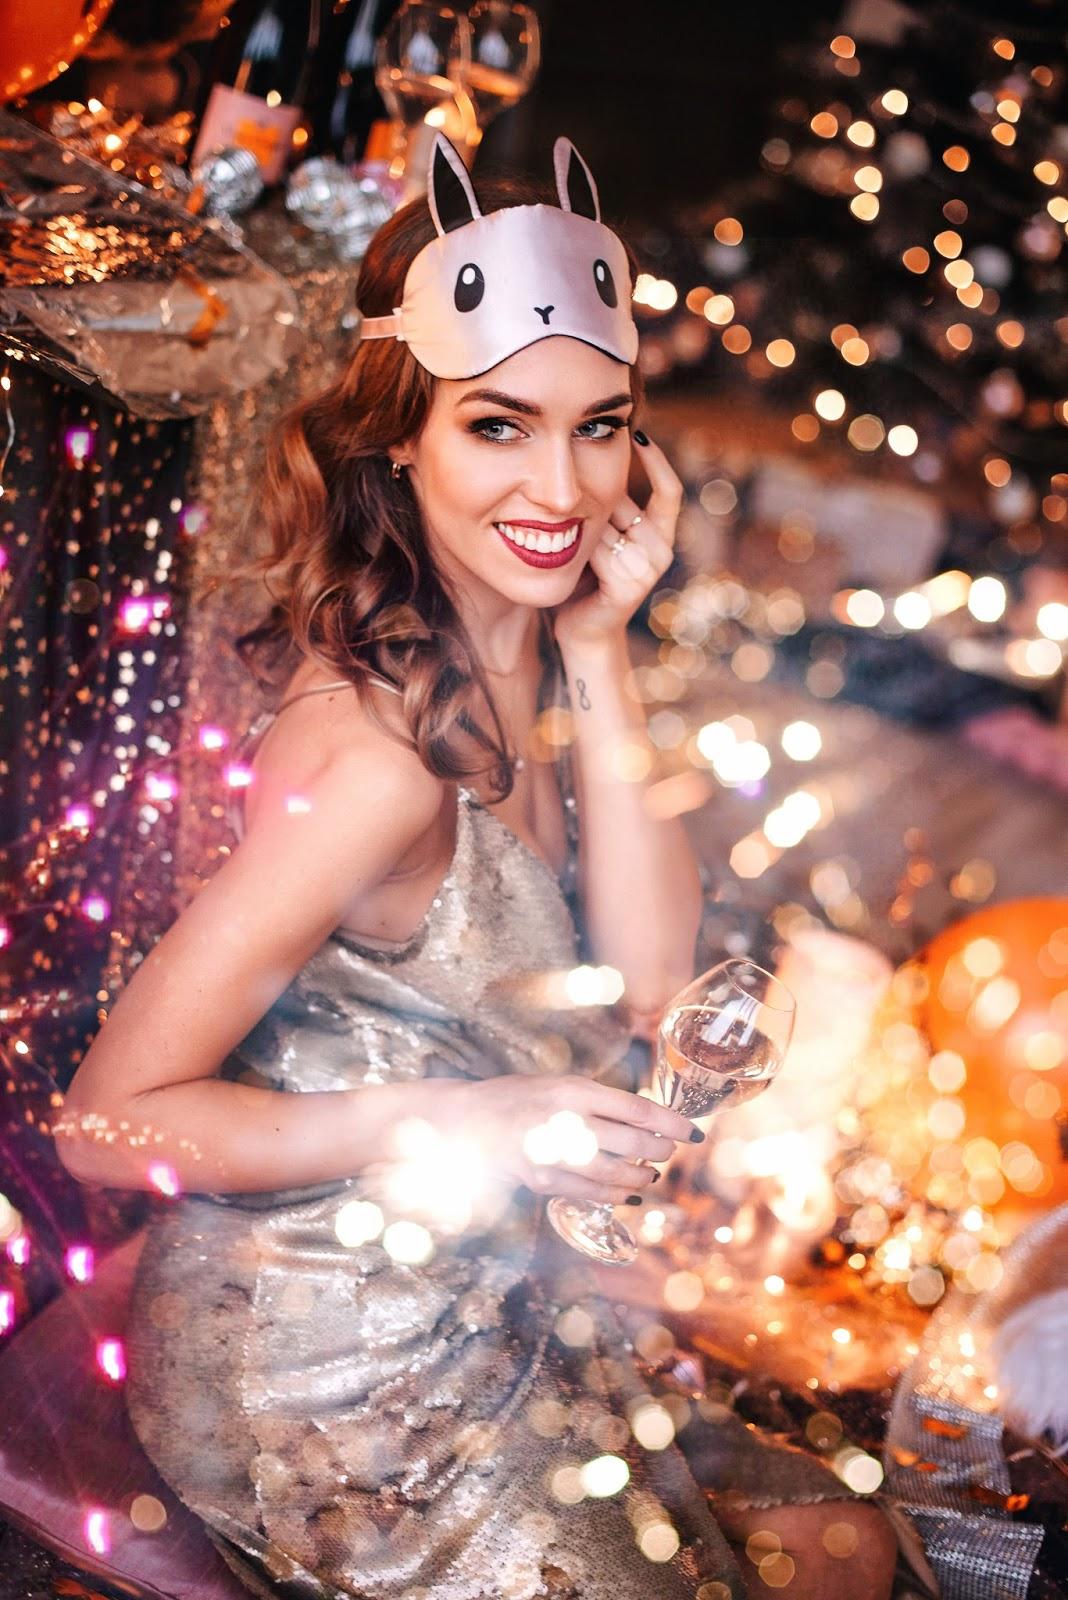 sequin dress glitter party celebration nye photoshoot